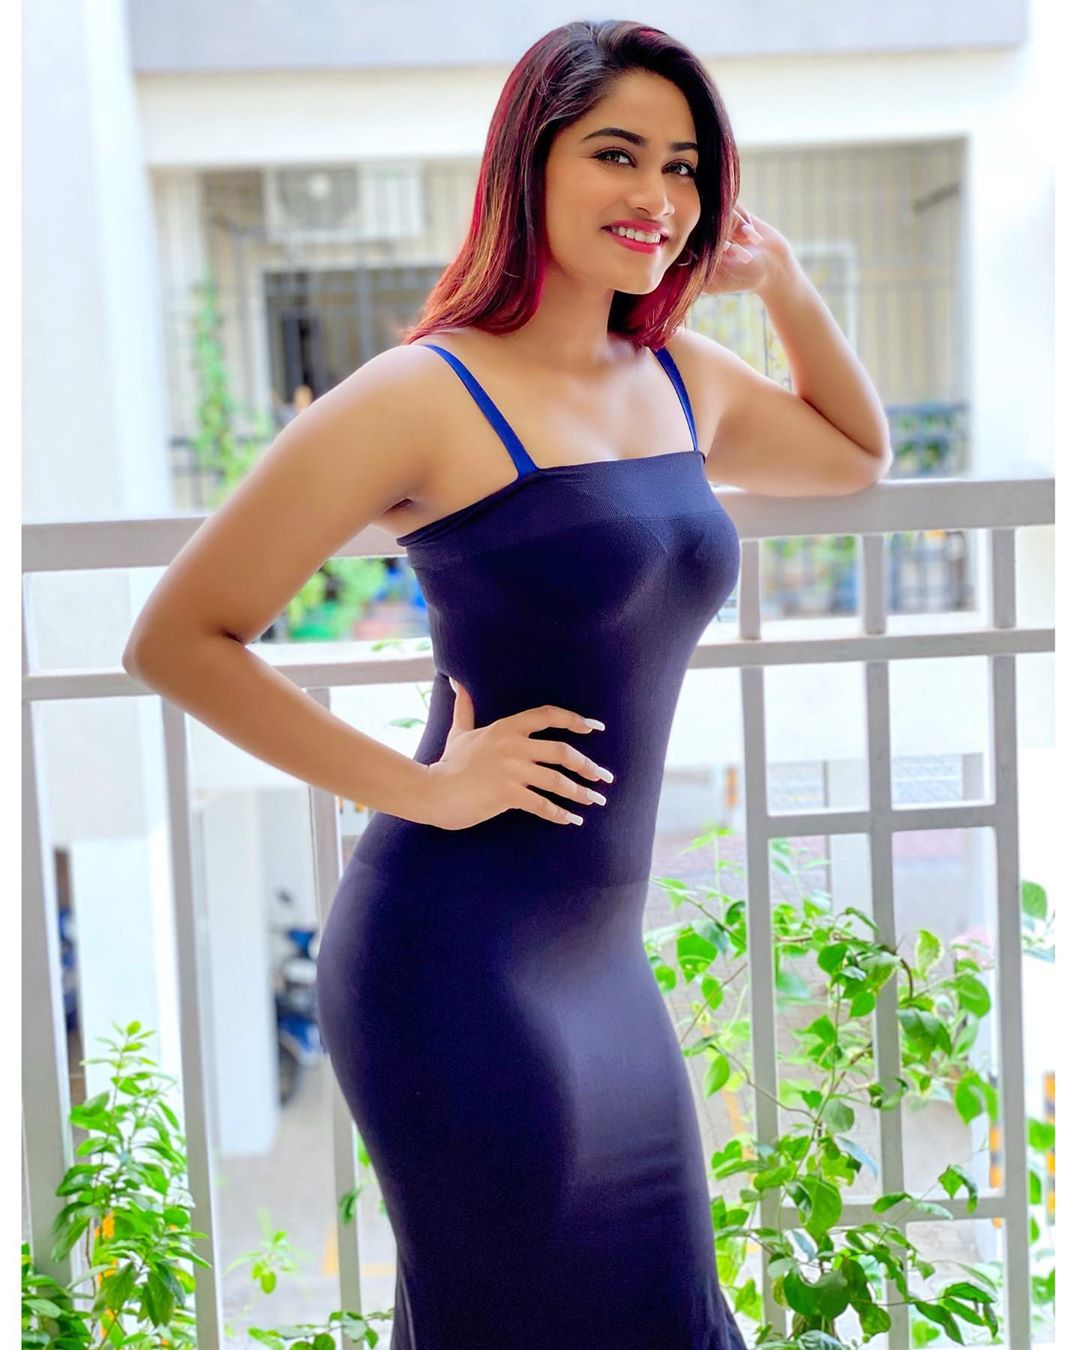 shivani narayanan Hot photos and latest movie news